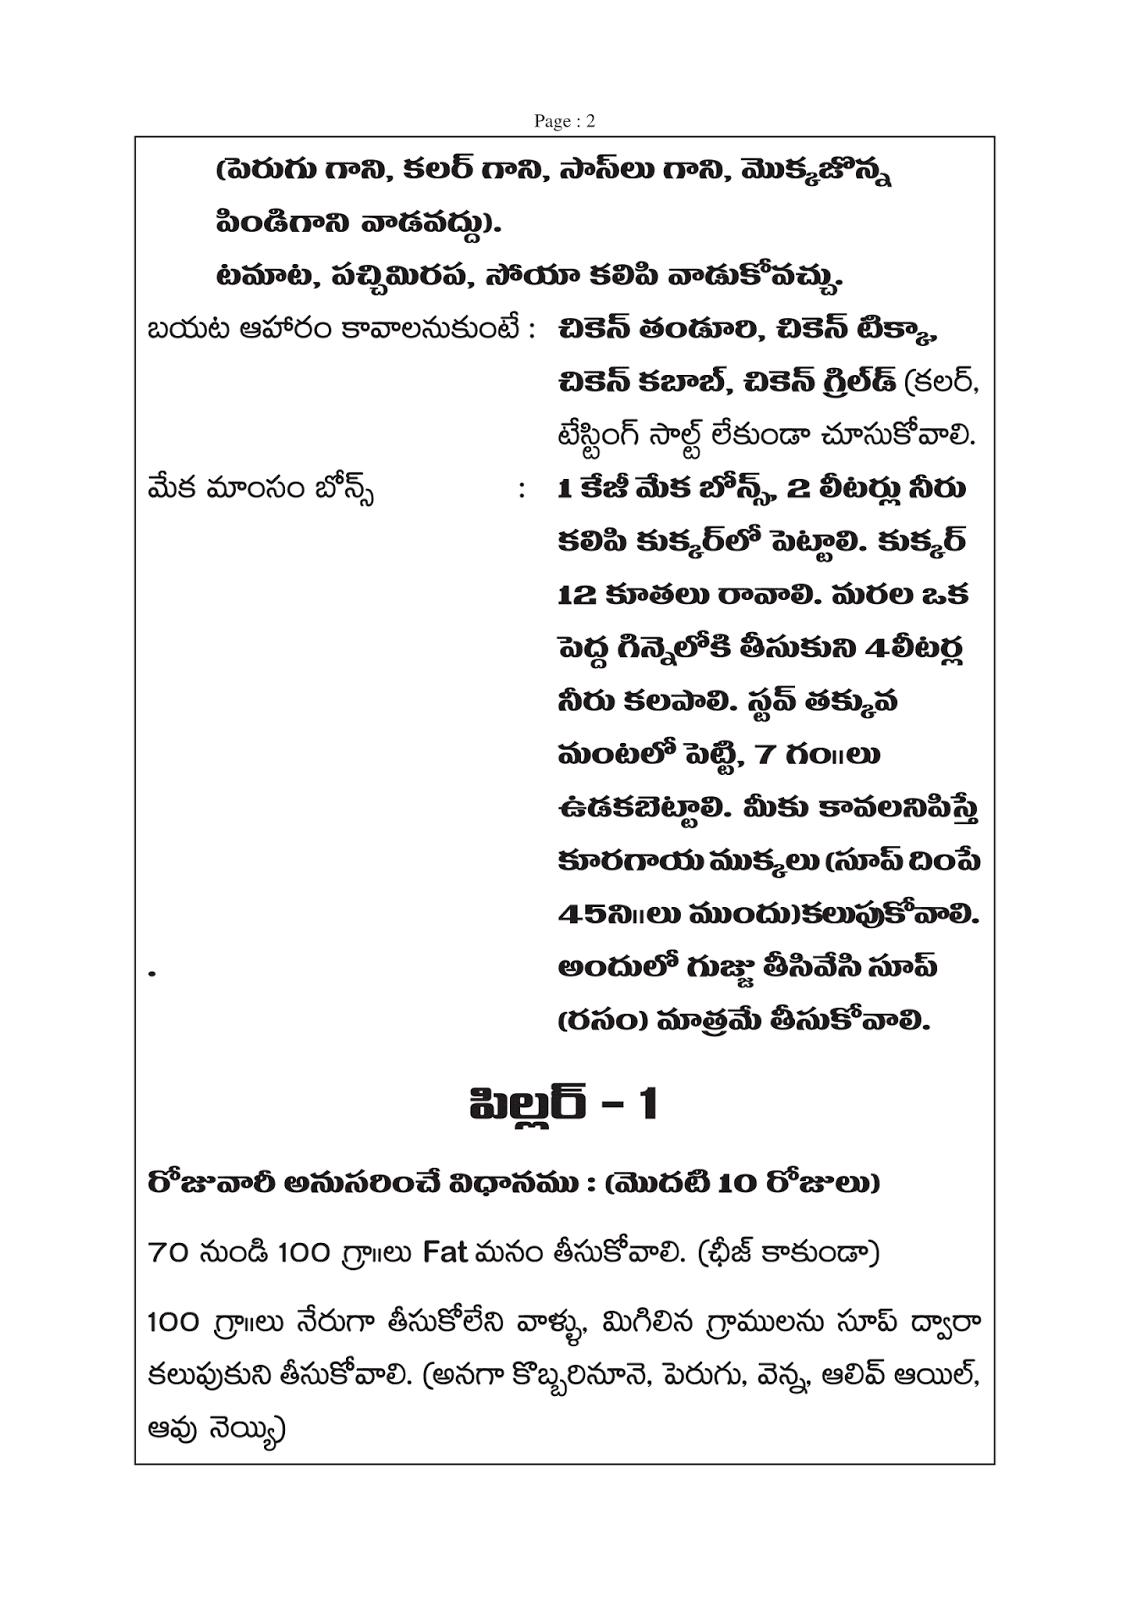 Veeramachaneni ramakrishna diet plan pillar also program in telugu part rh veeramachaneniramakrishnadietprogramspot